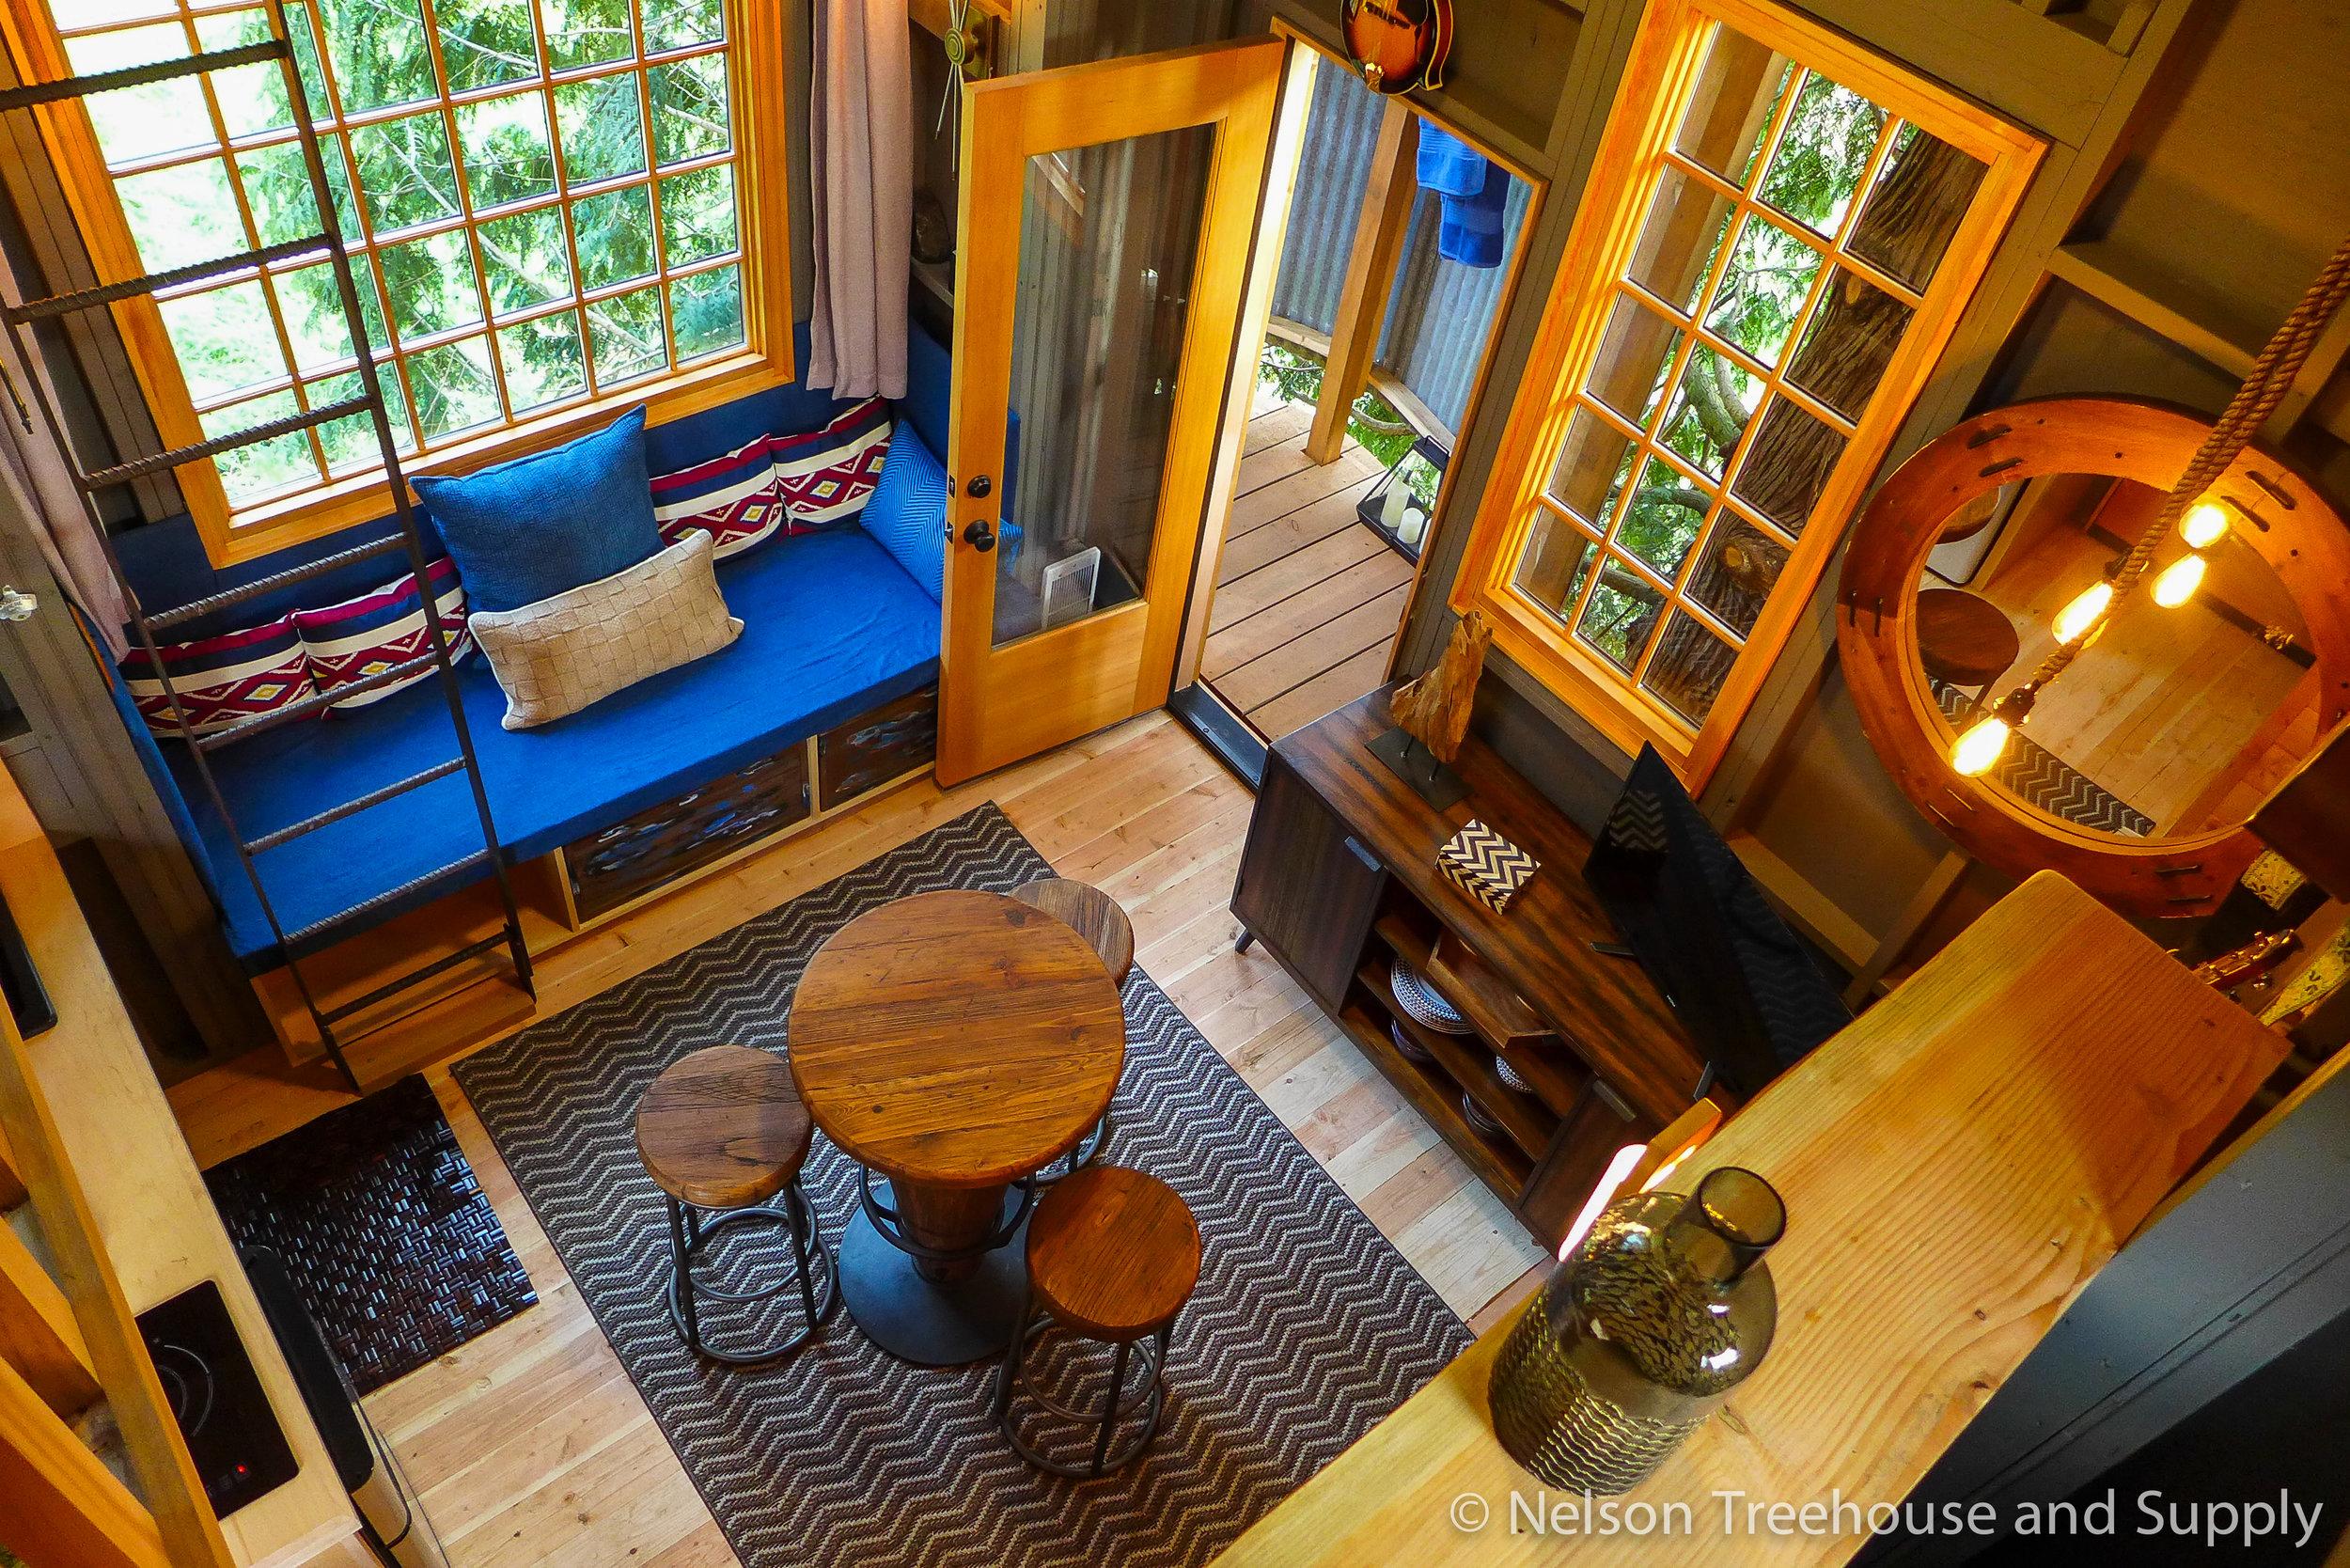 charlies_treehouse_interior